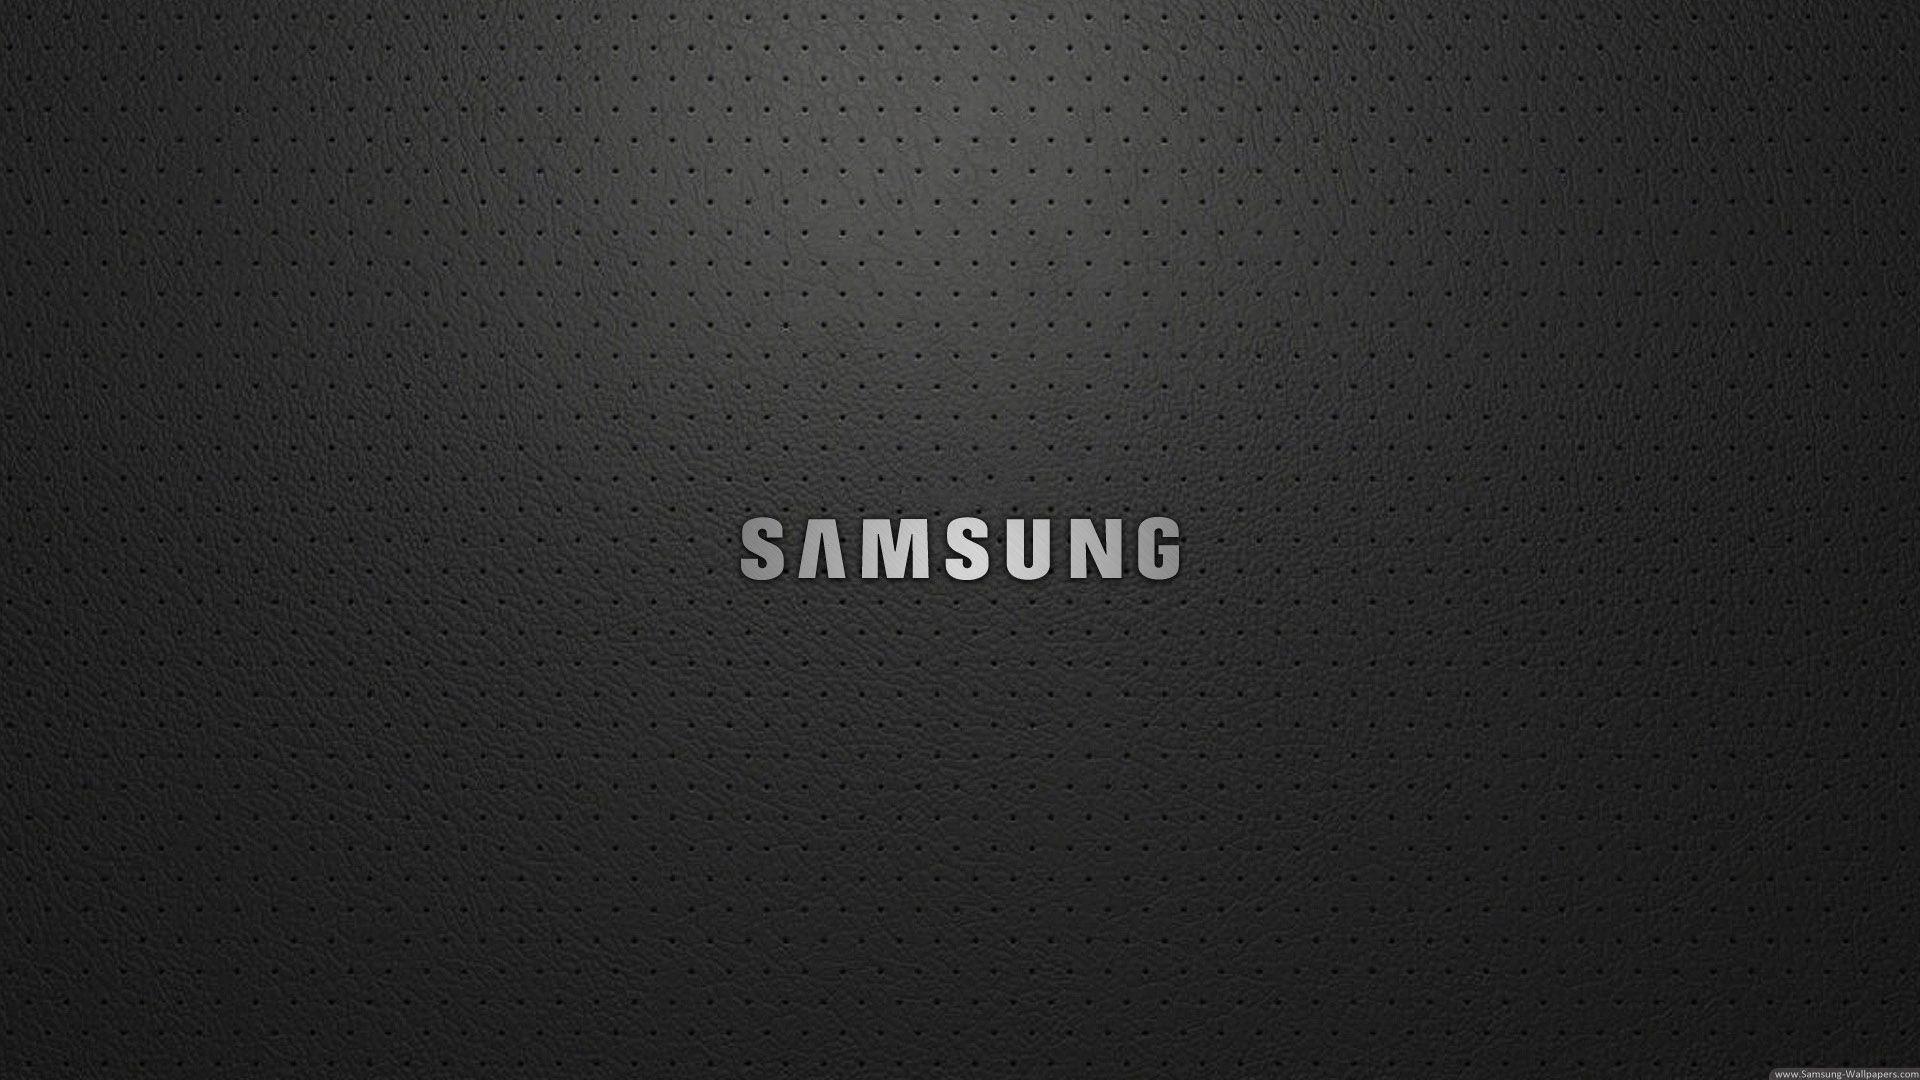 Samsung Galaxy S3 Wallpapers Hd: Screensavers For Samsung Galaxy S3